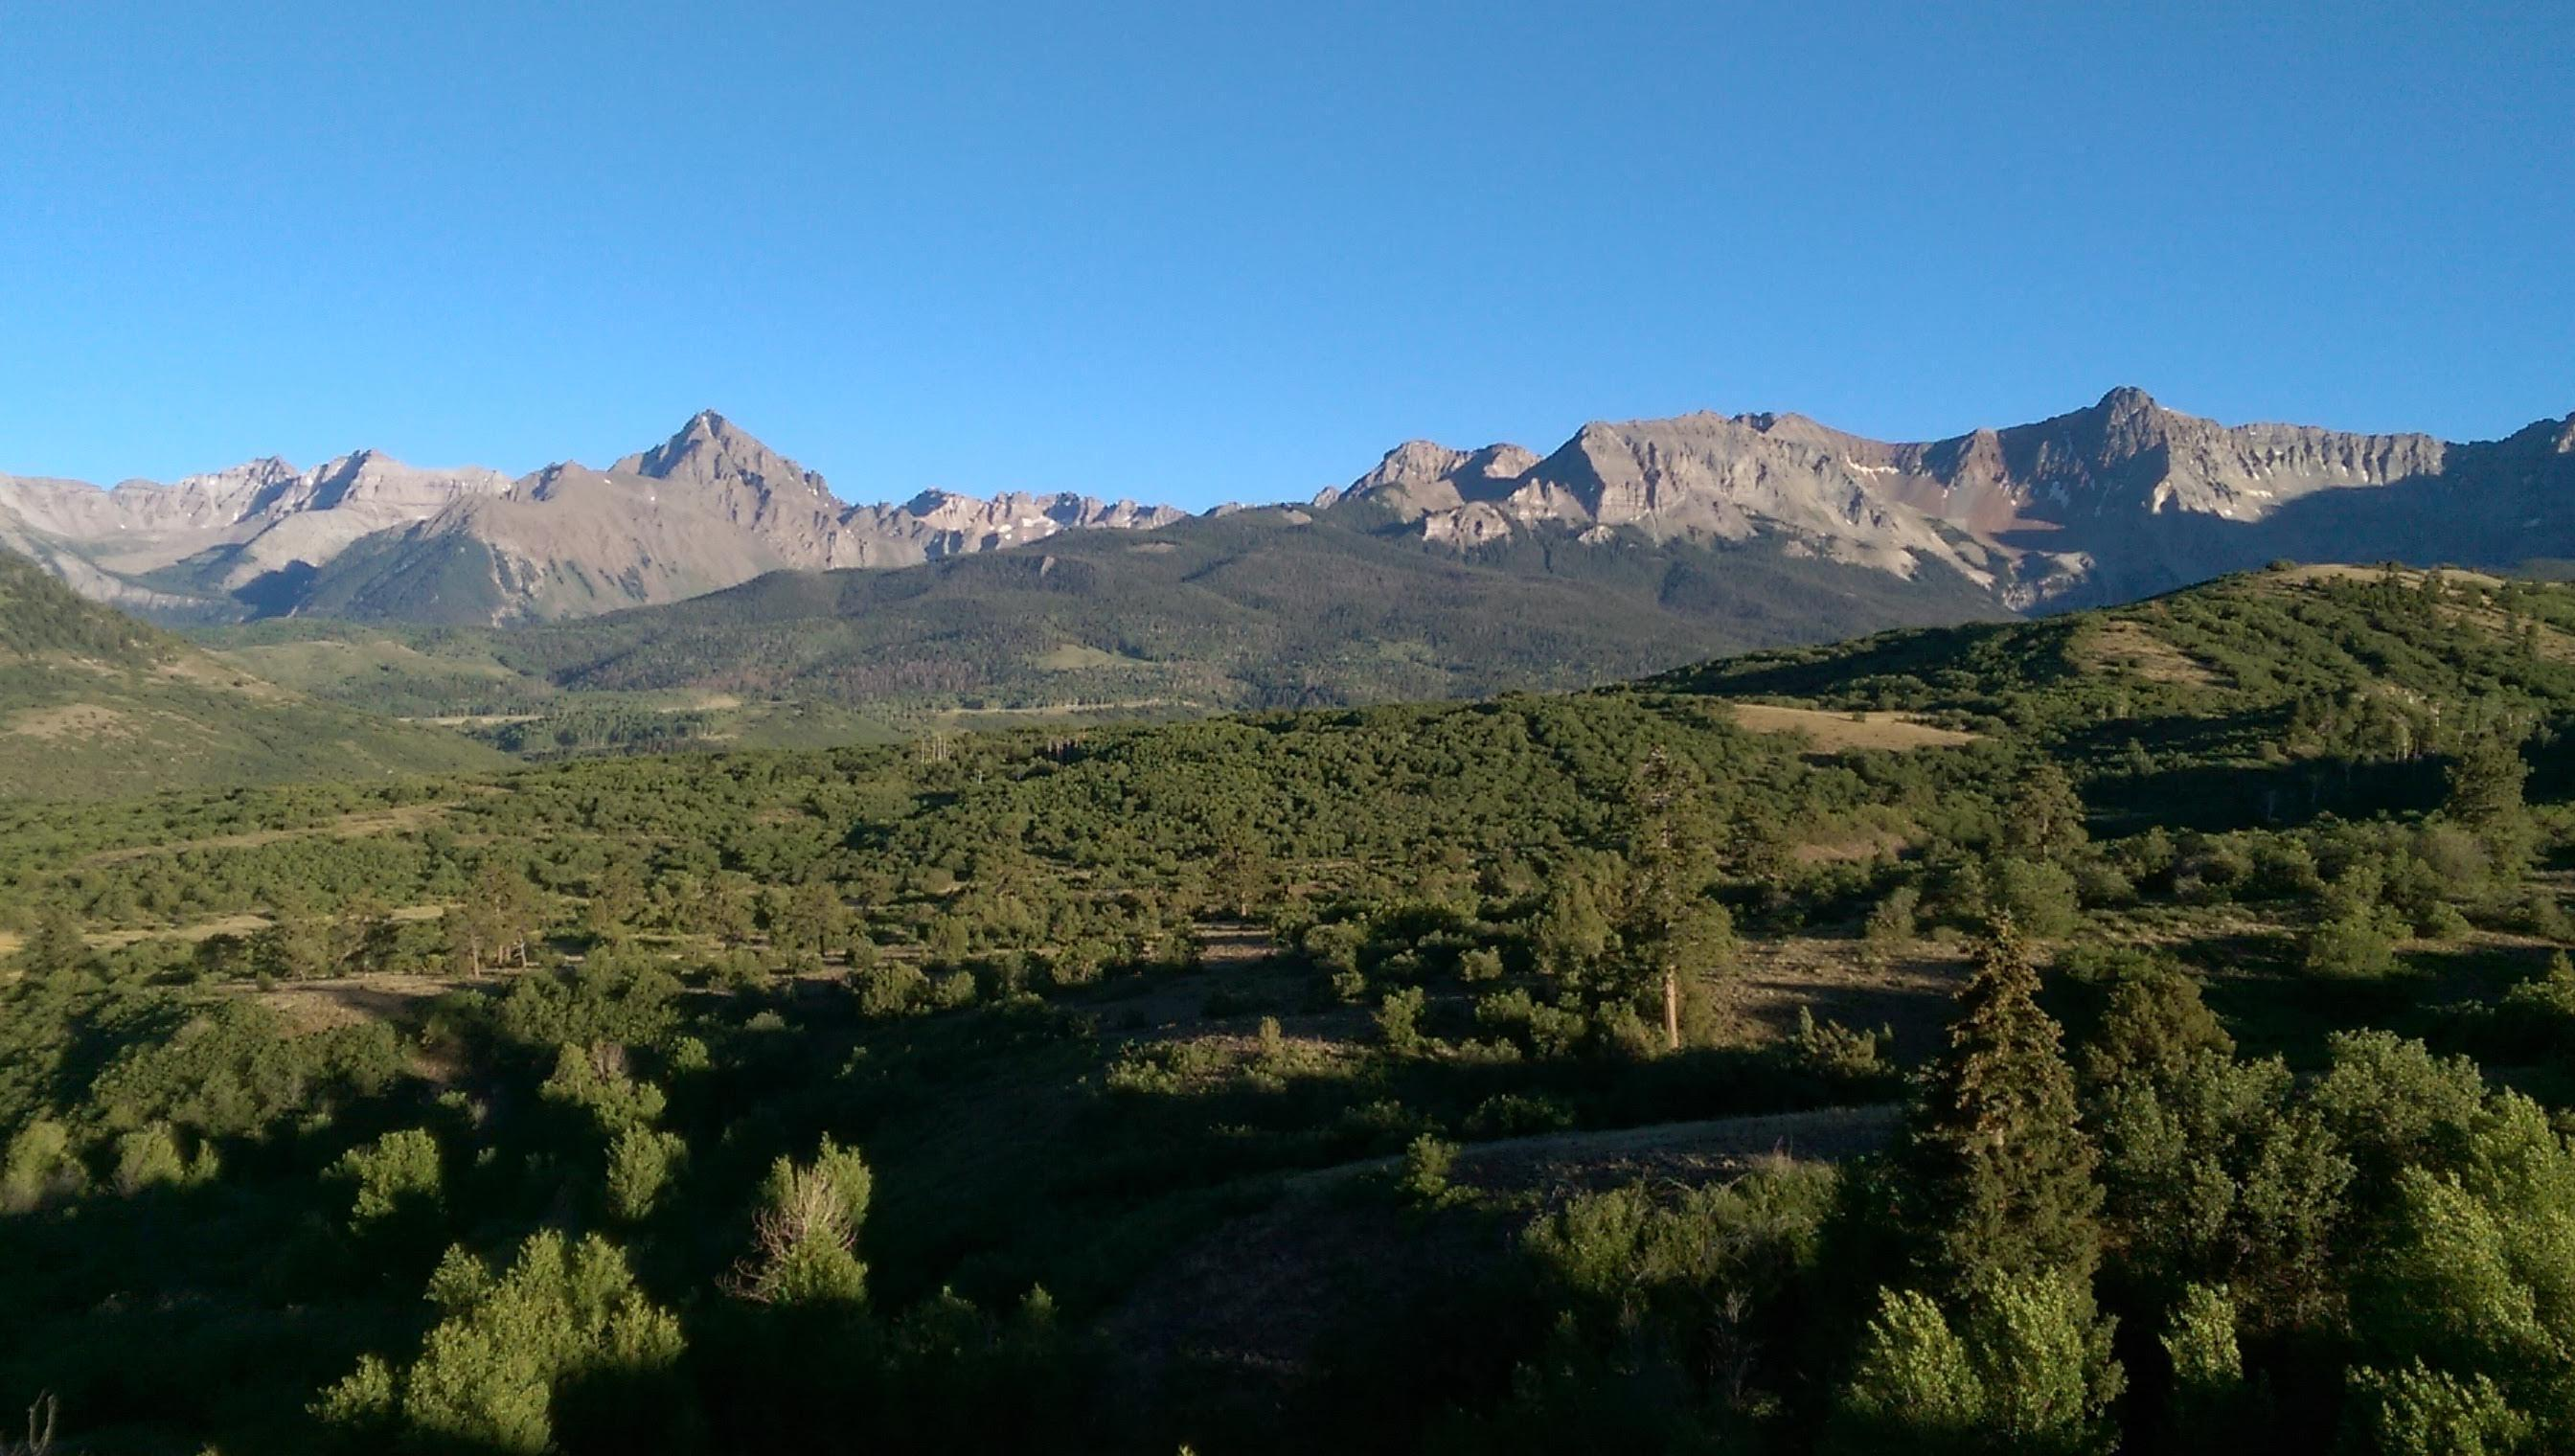 Rocky Mountains near Ridgeway Colorado